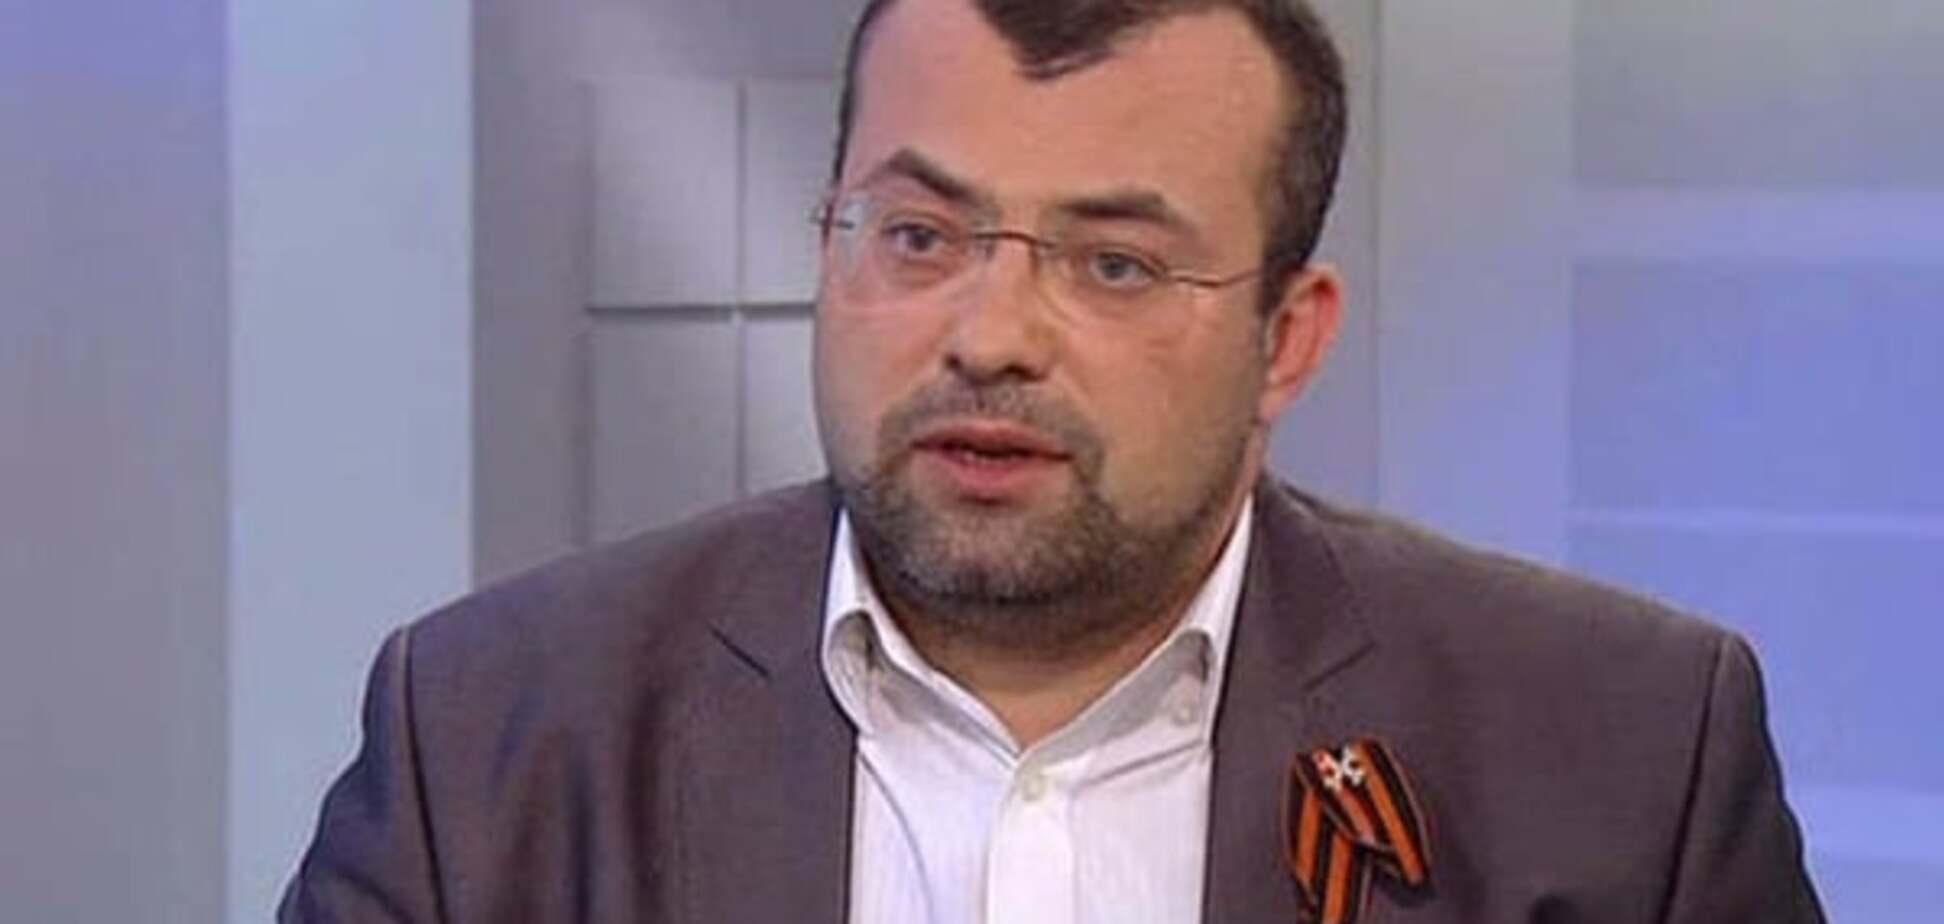 Бывший \'министр иностранных дел\' \'ДНР\' Александр Кофман